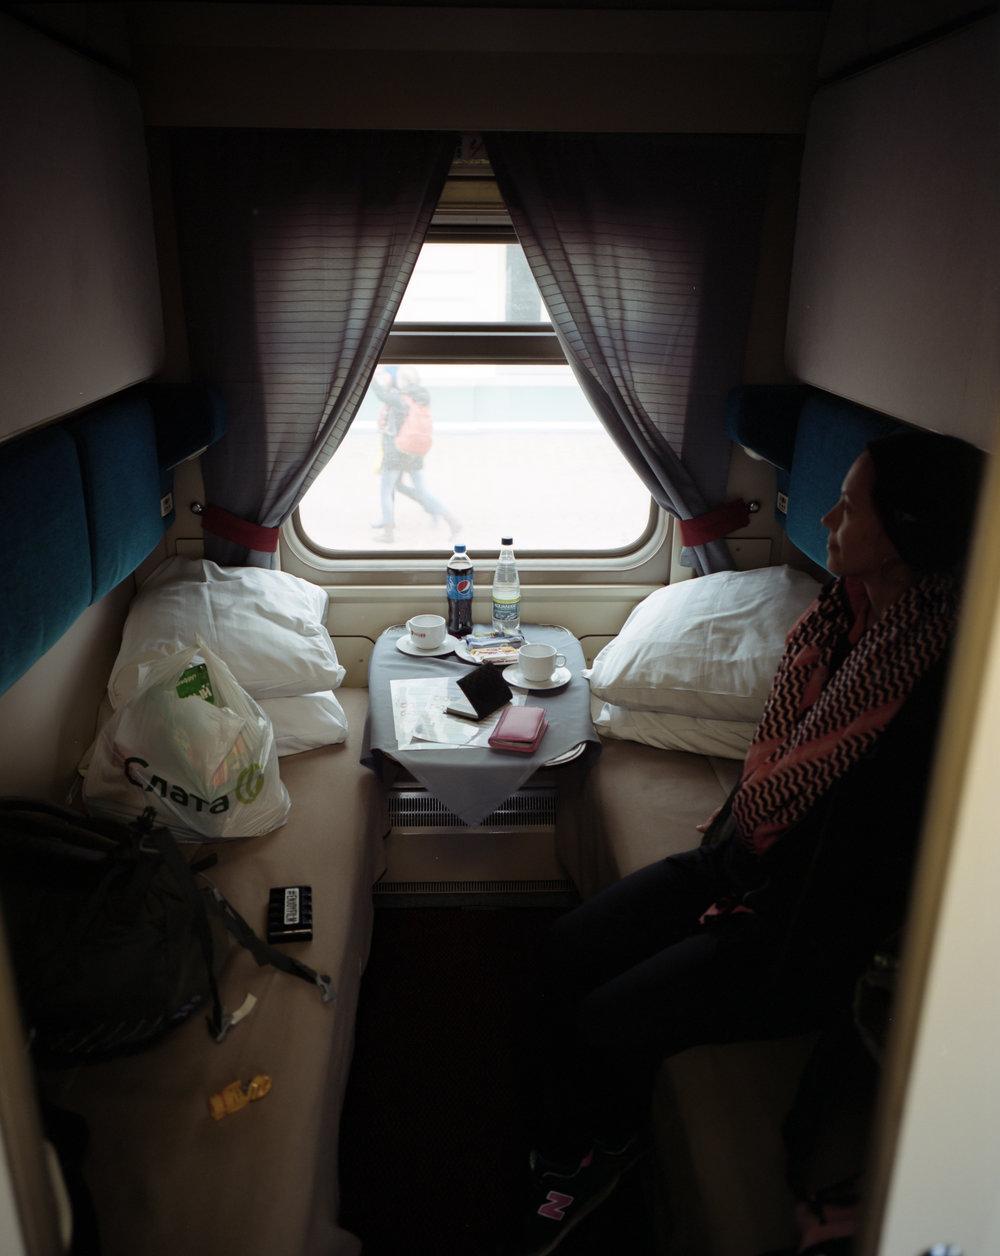 Our room Fuji GF670w | Kodak Portra 400